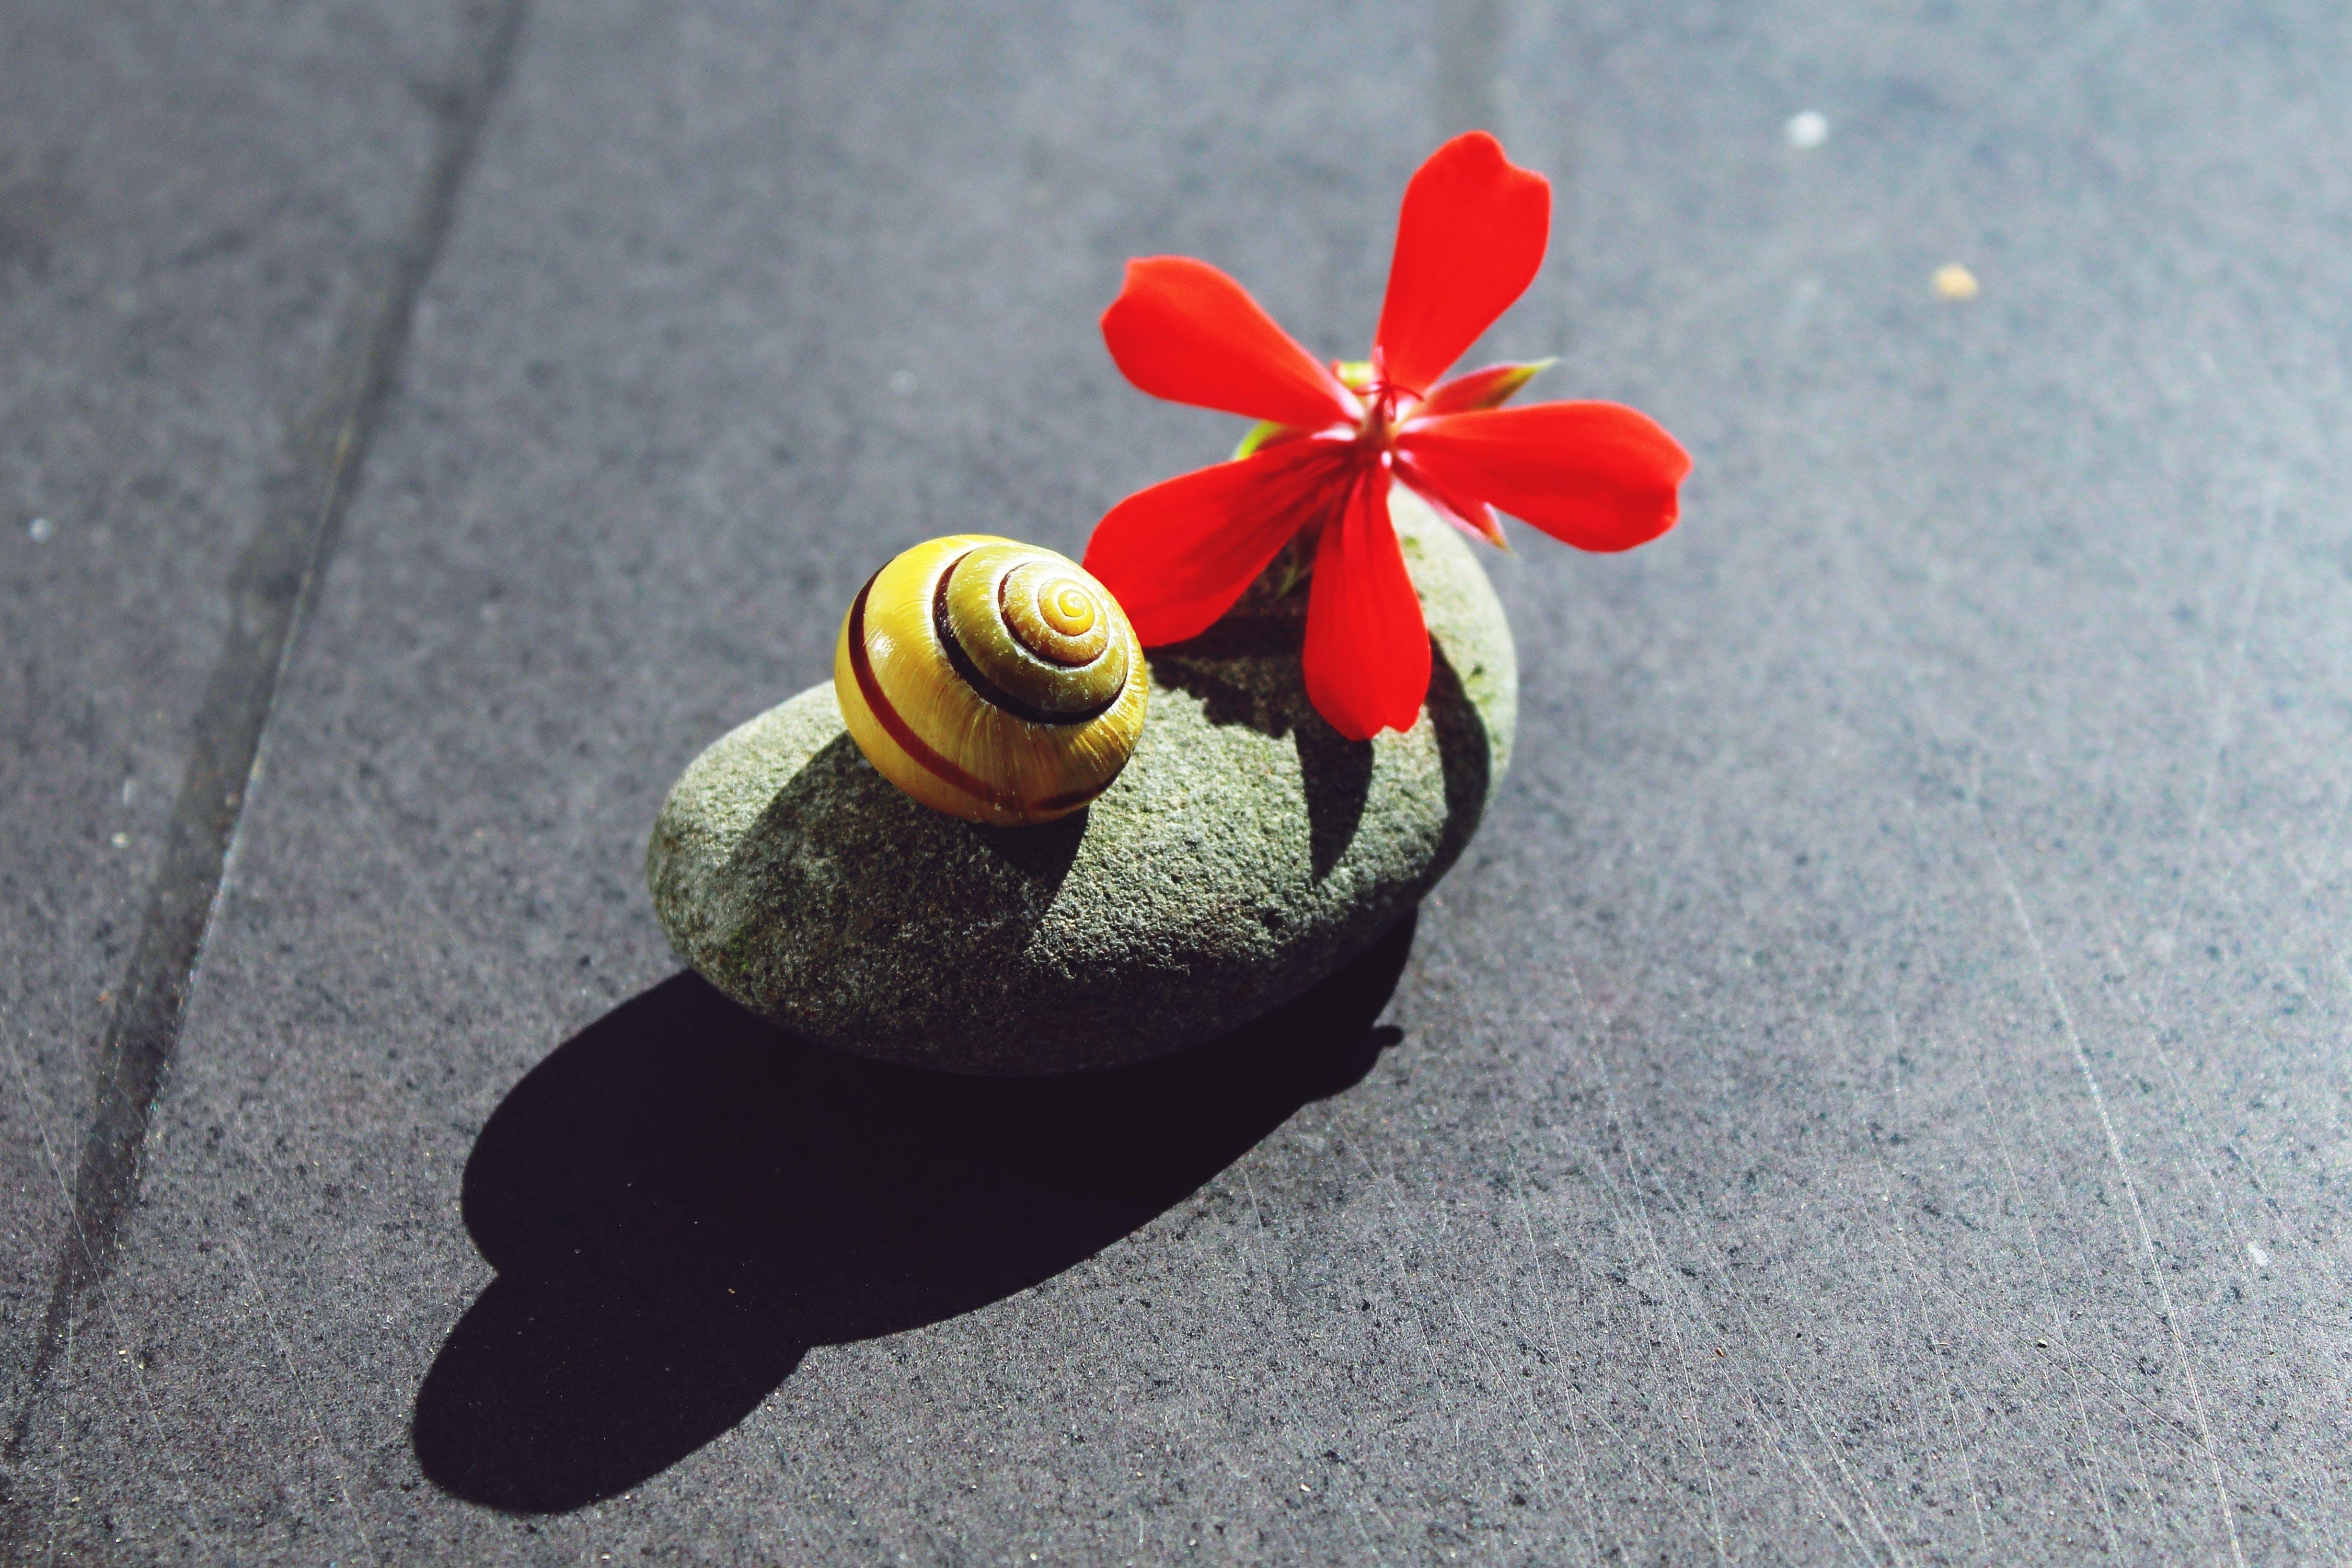 Free stock photo of balance, balanced, bloom, blossom